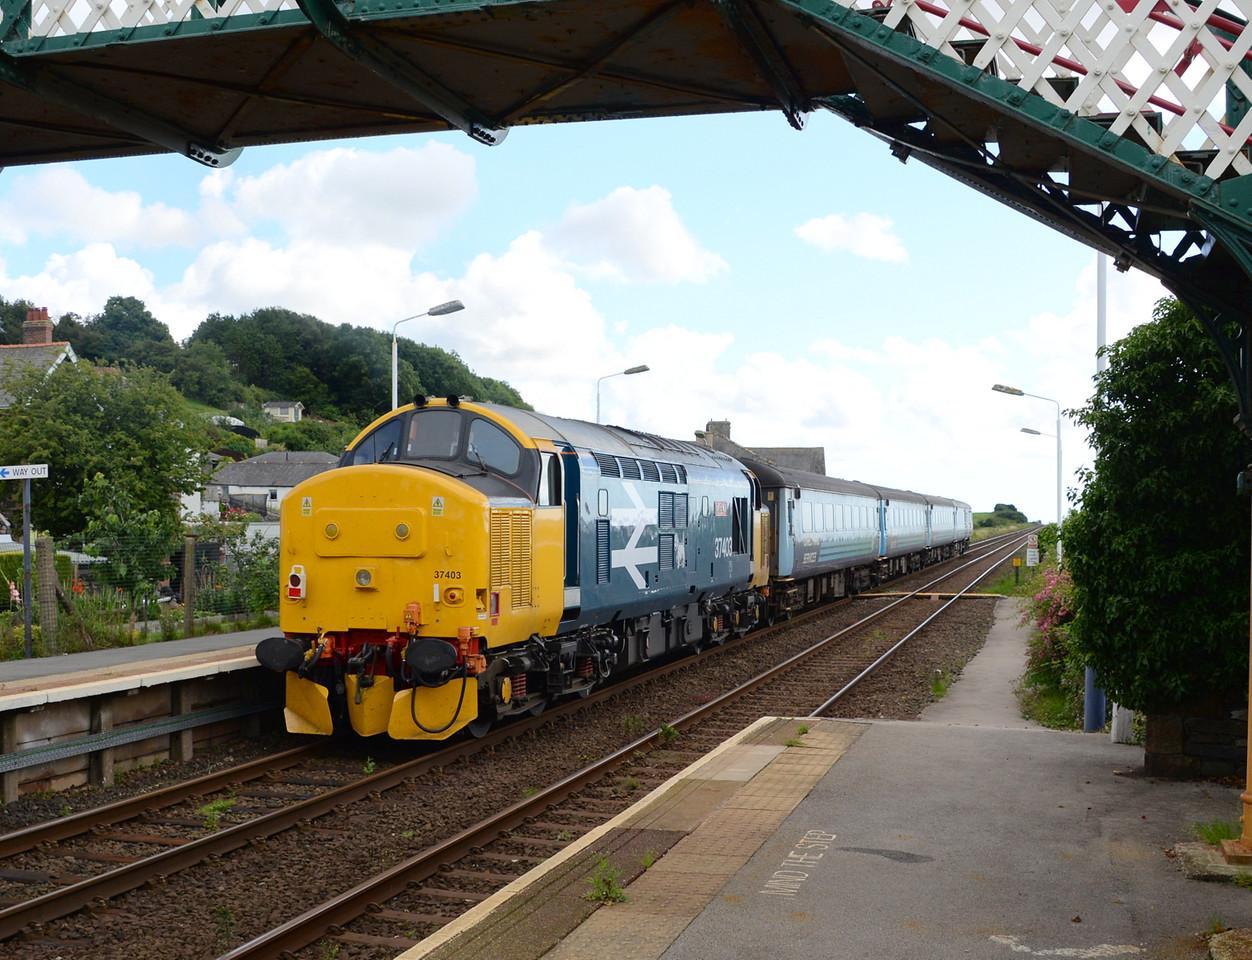 37403, Kirkby in Furness. 30/07/16.